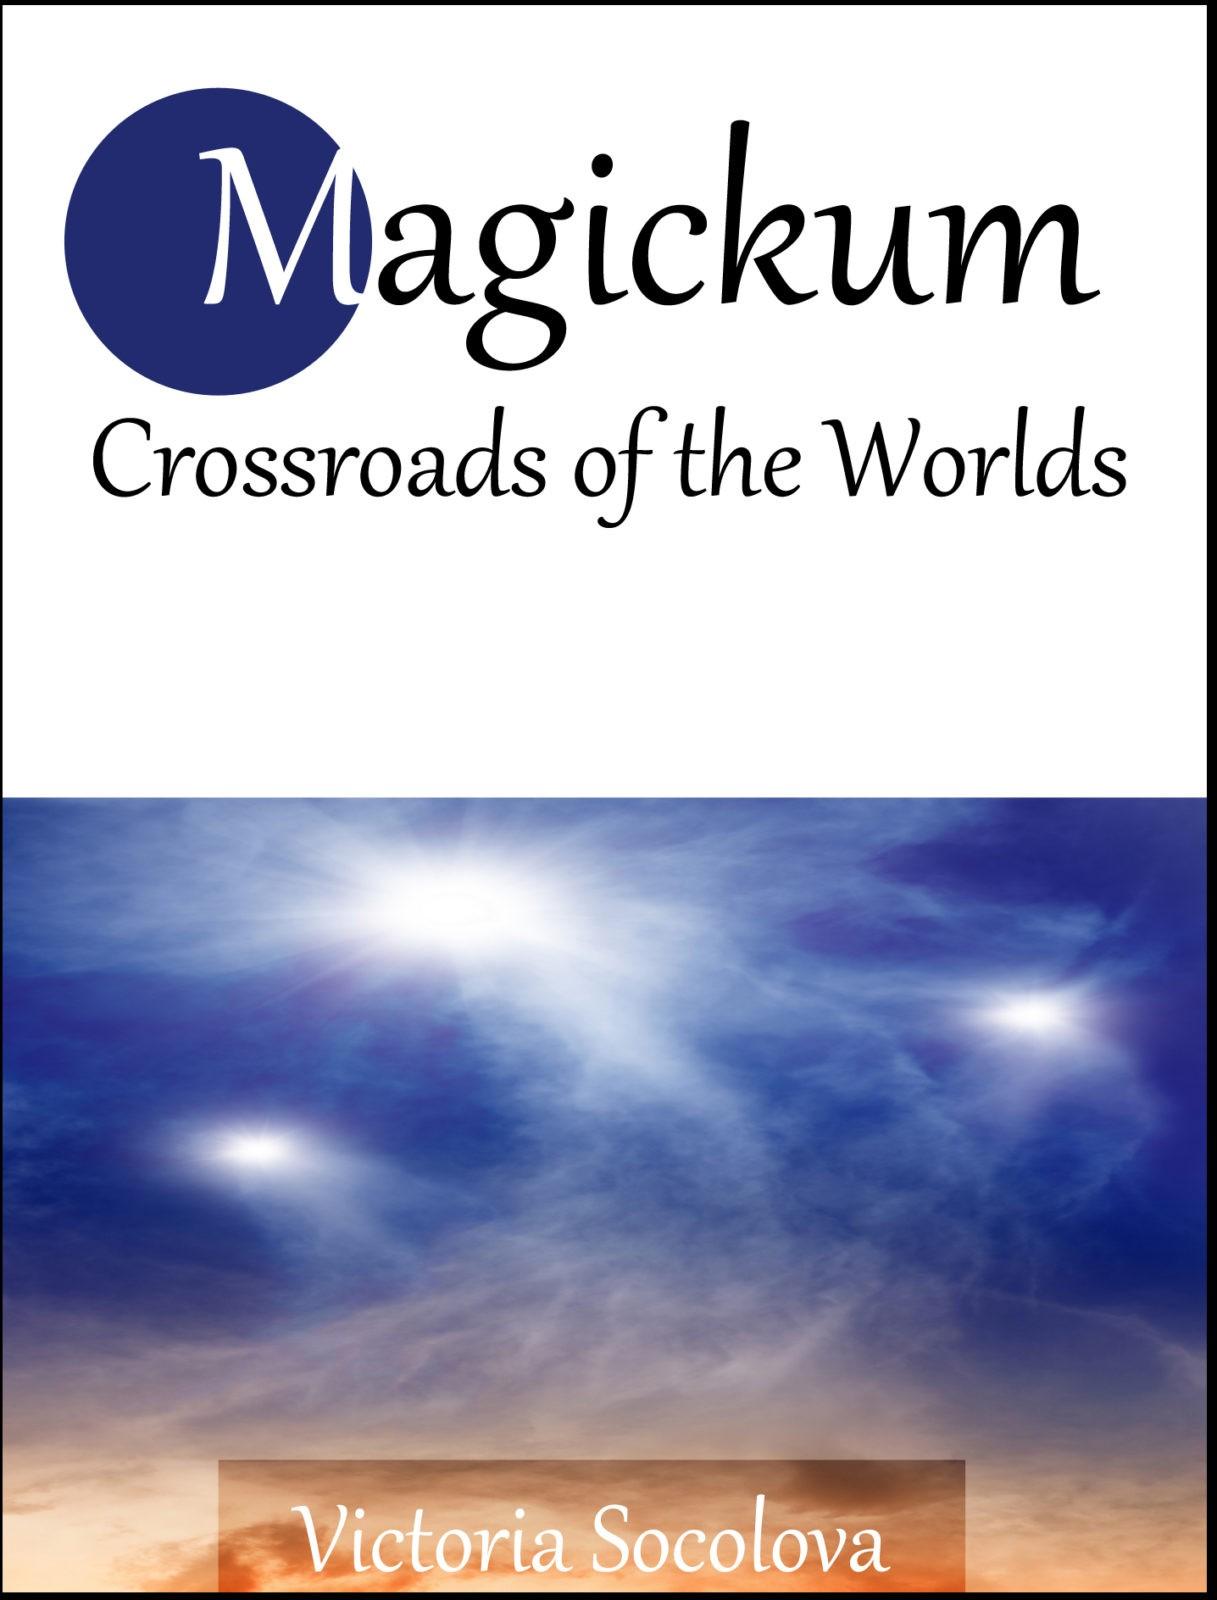 Magickum. Prophetic dreams and lucid dreaming. Theory and practice.E-books:Amazon   XinXii   SmashwordsPaperback:Amazon  